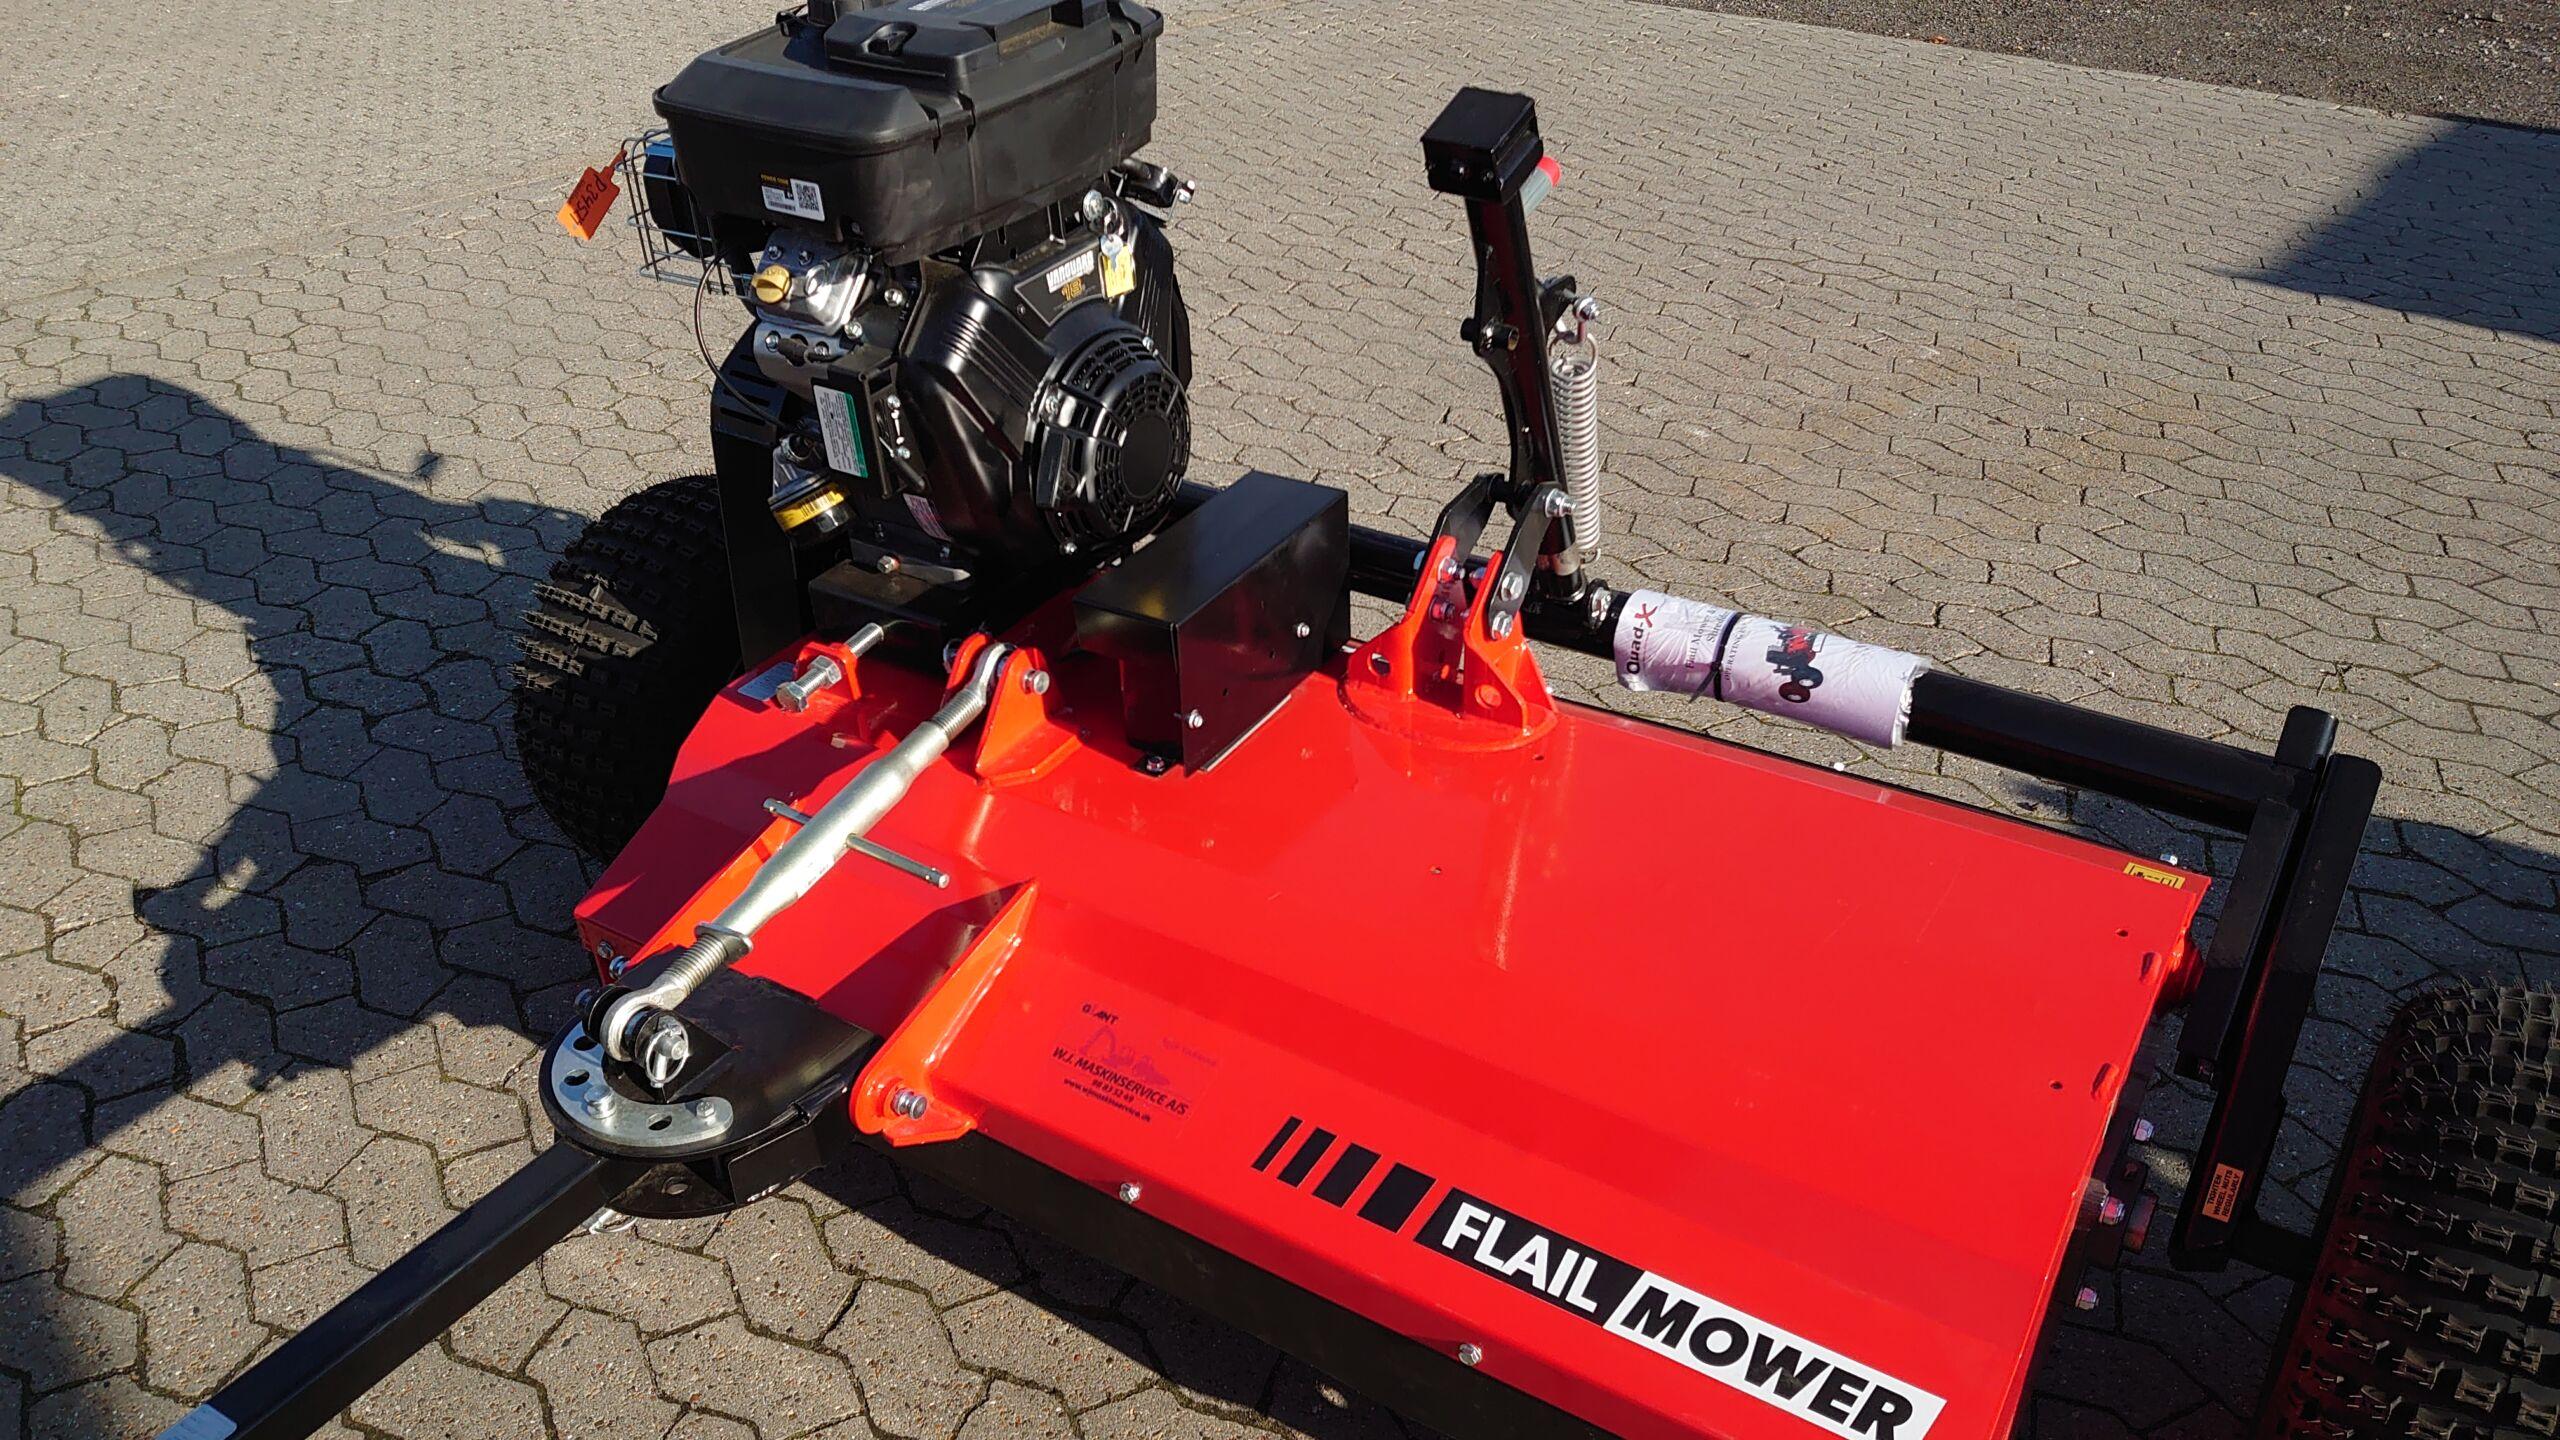 QUARD-X ATV 130 Cm. Slagleklipper